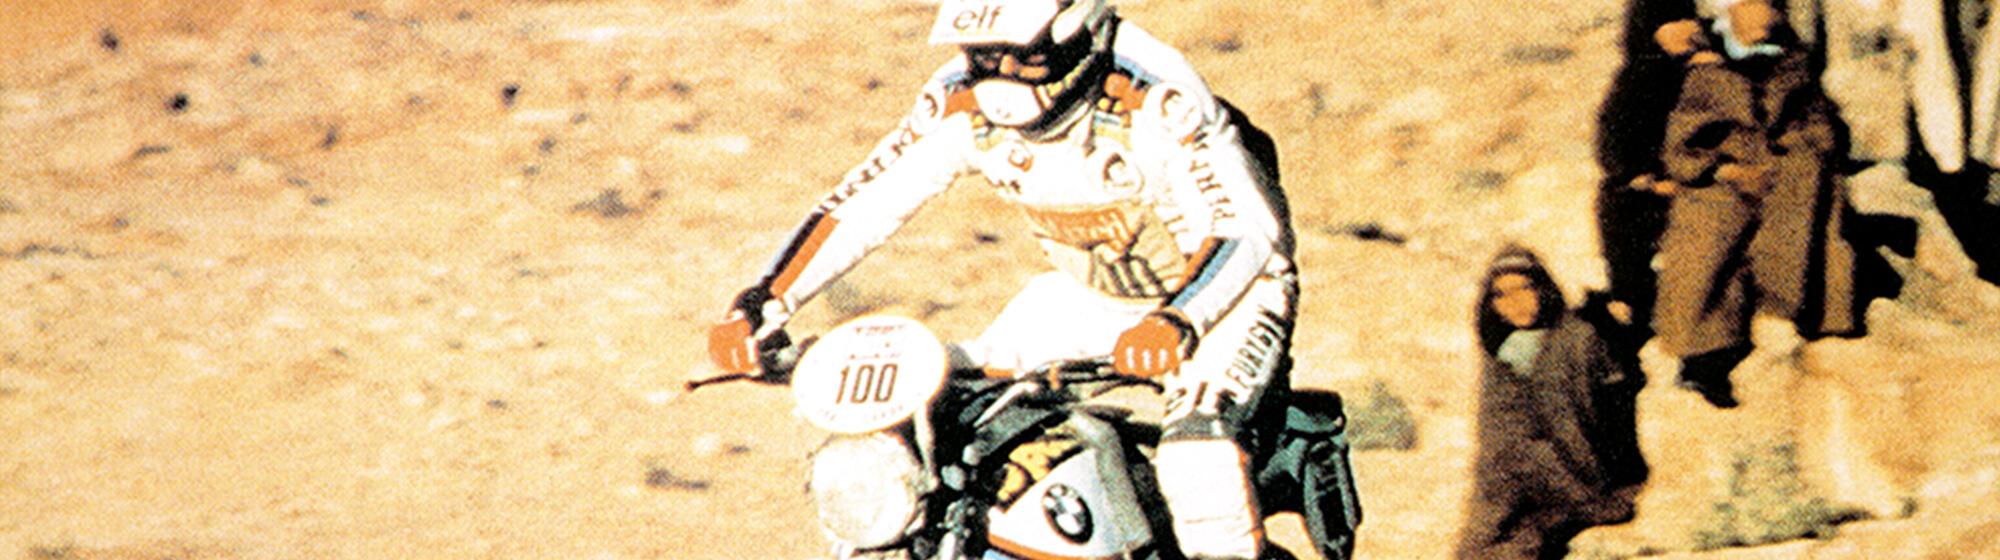 Paris-Dakar rally 1981: the first BMW GS 800 airheads at the start